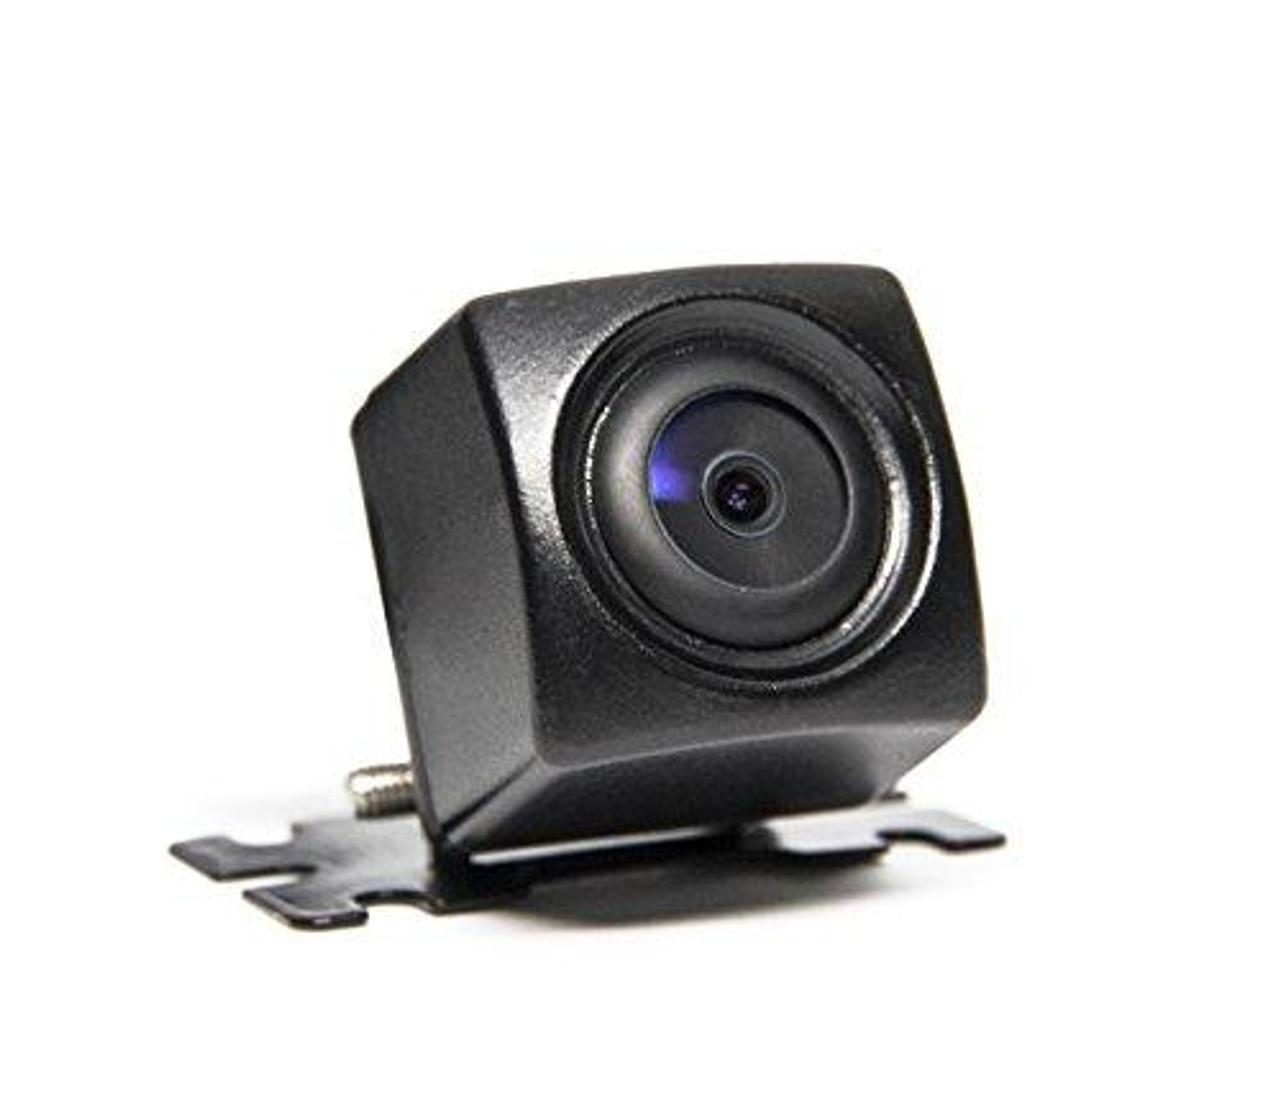 Rear View Safety RVS-776 Video Camera (Black)